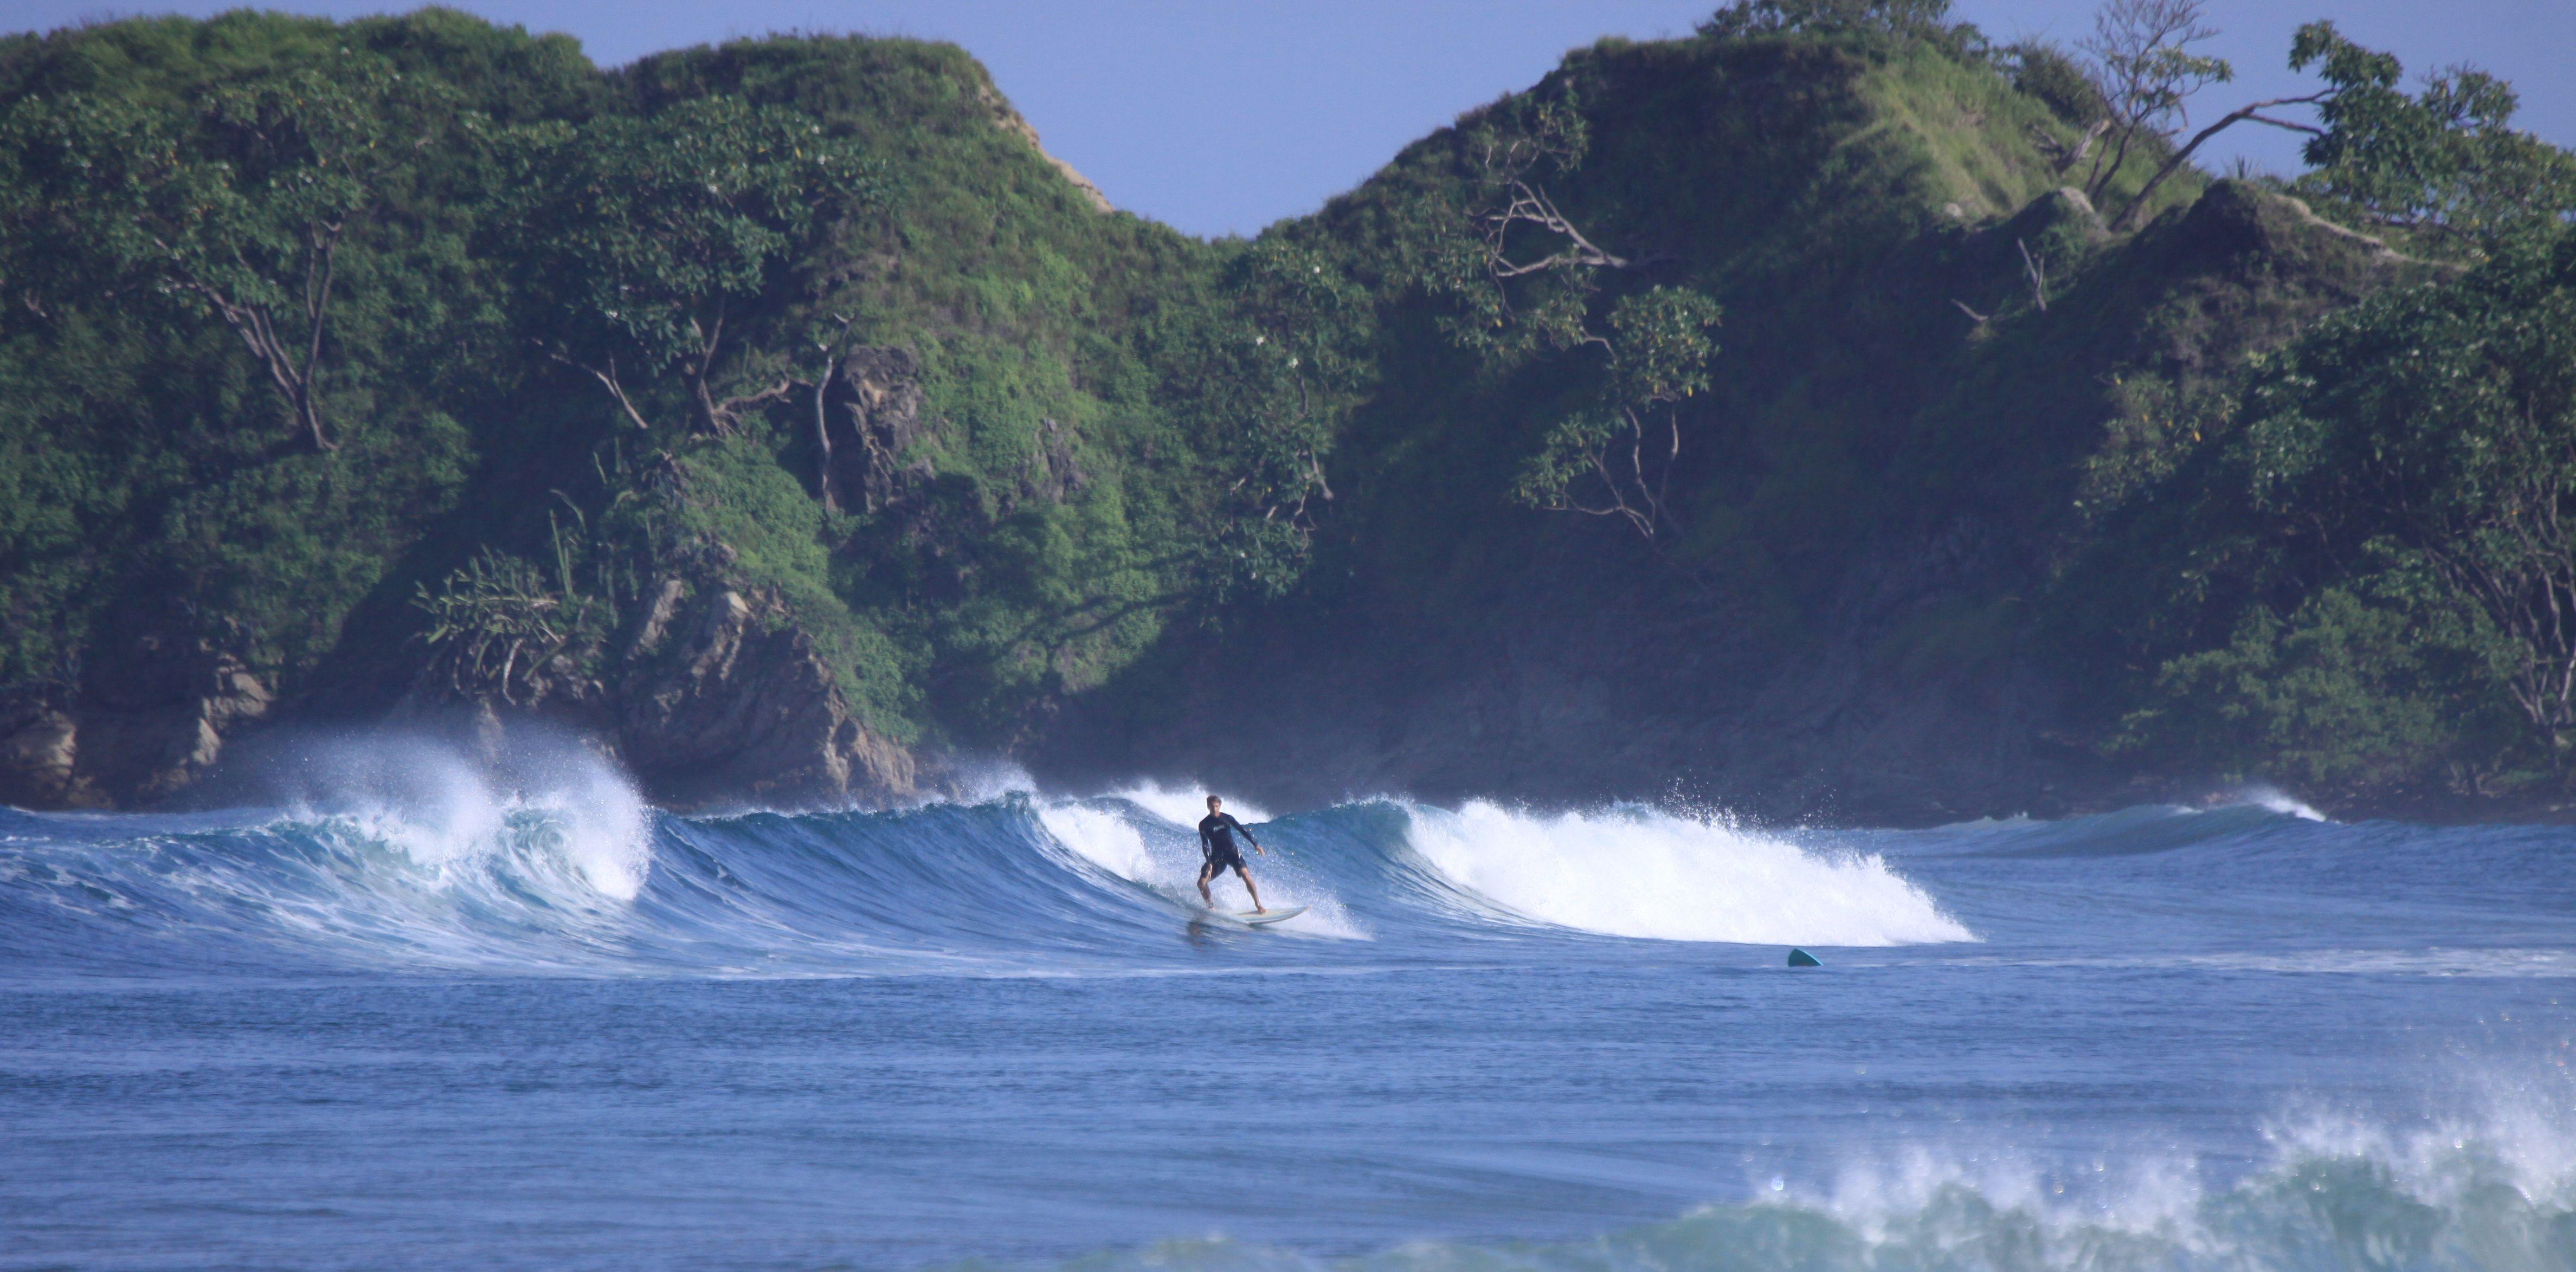 Surfing_Nosara-20.jpg